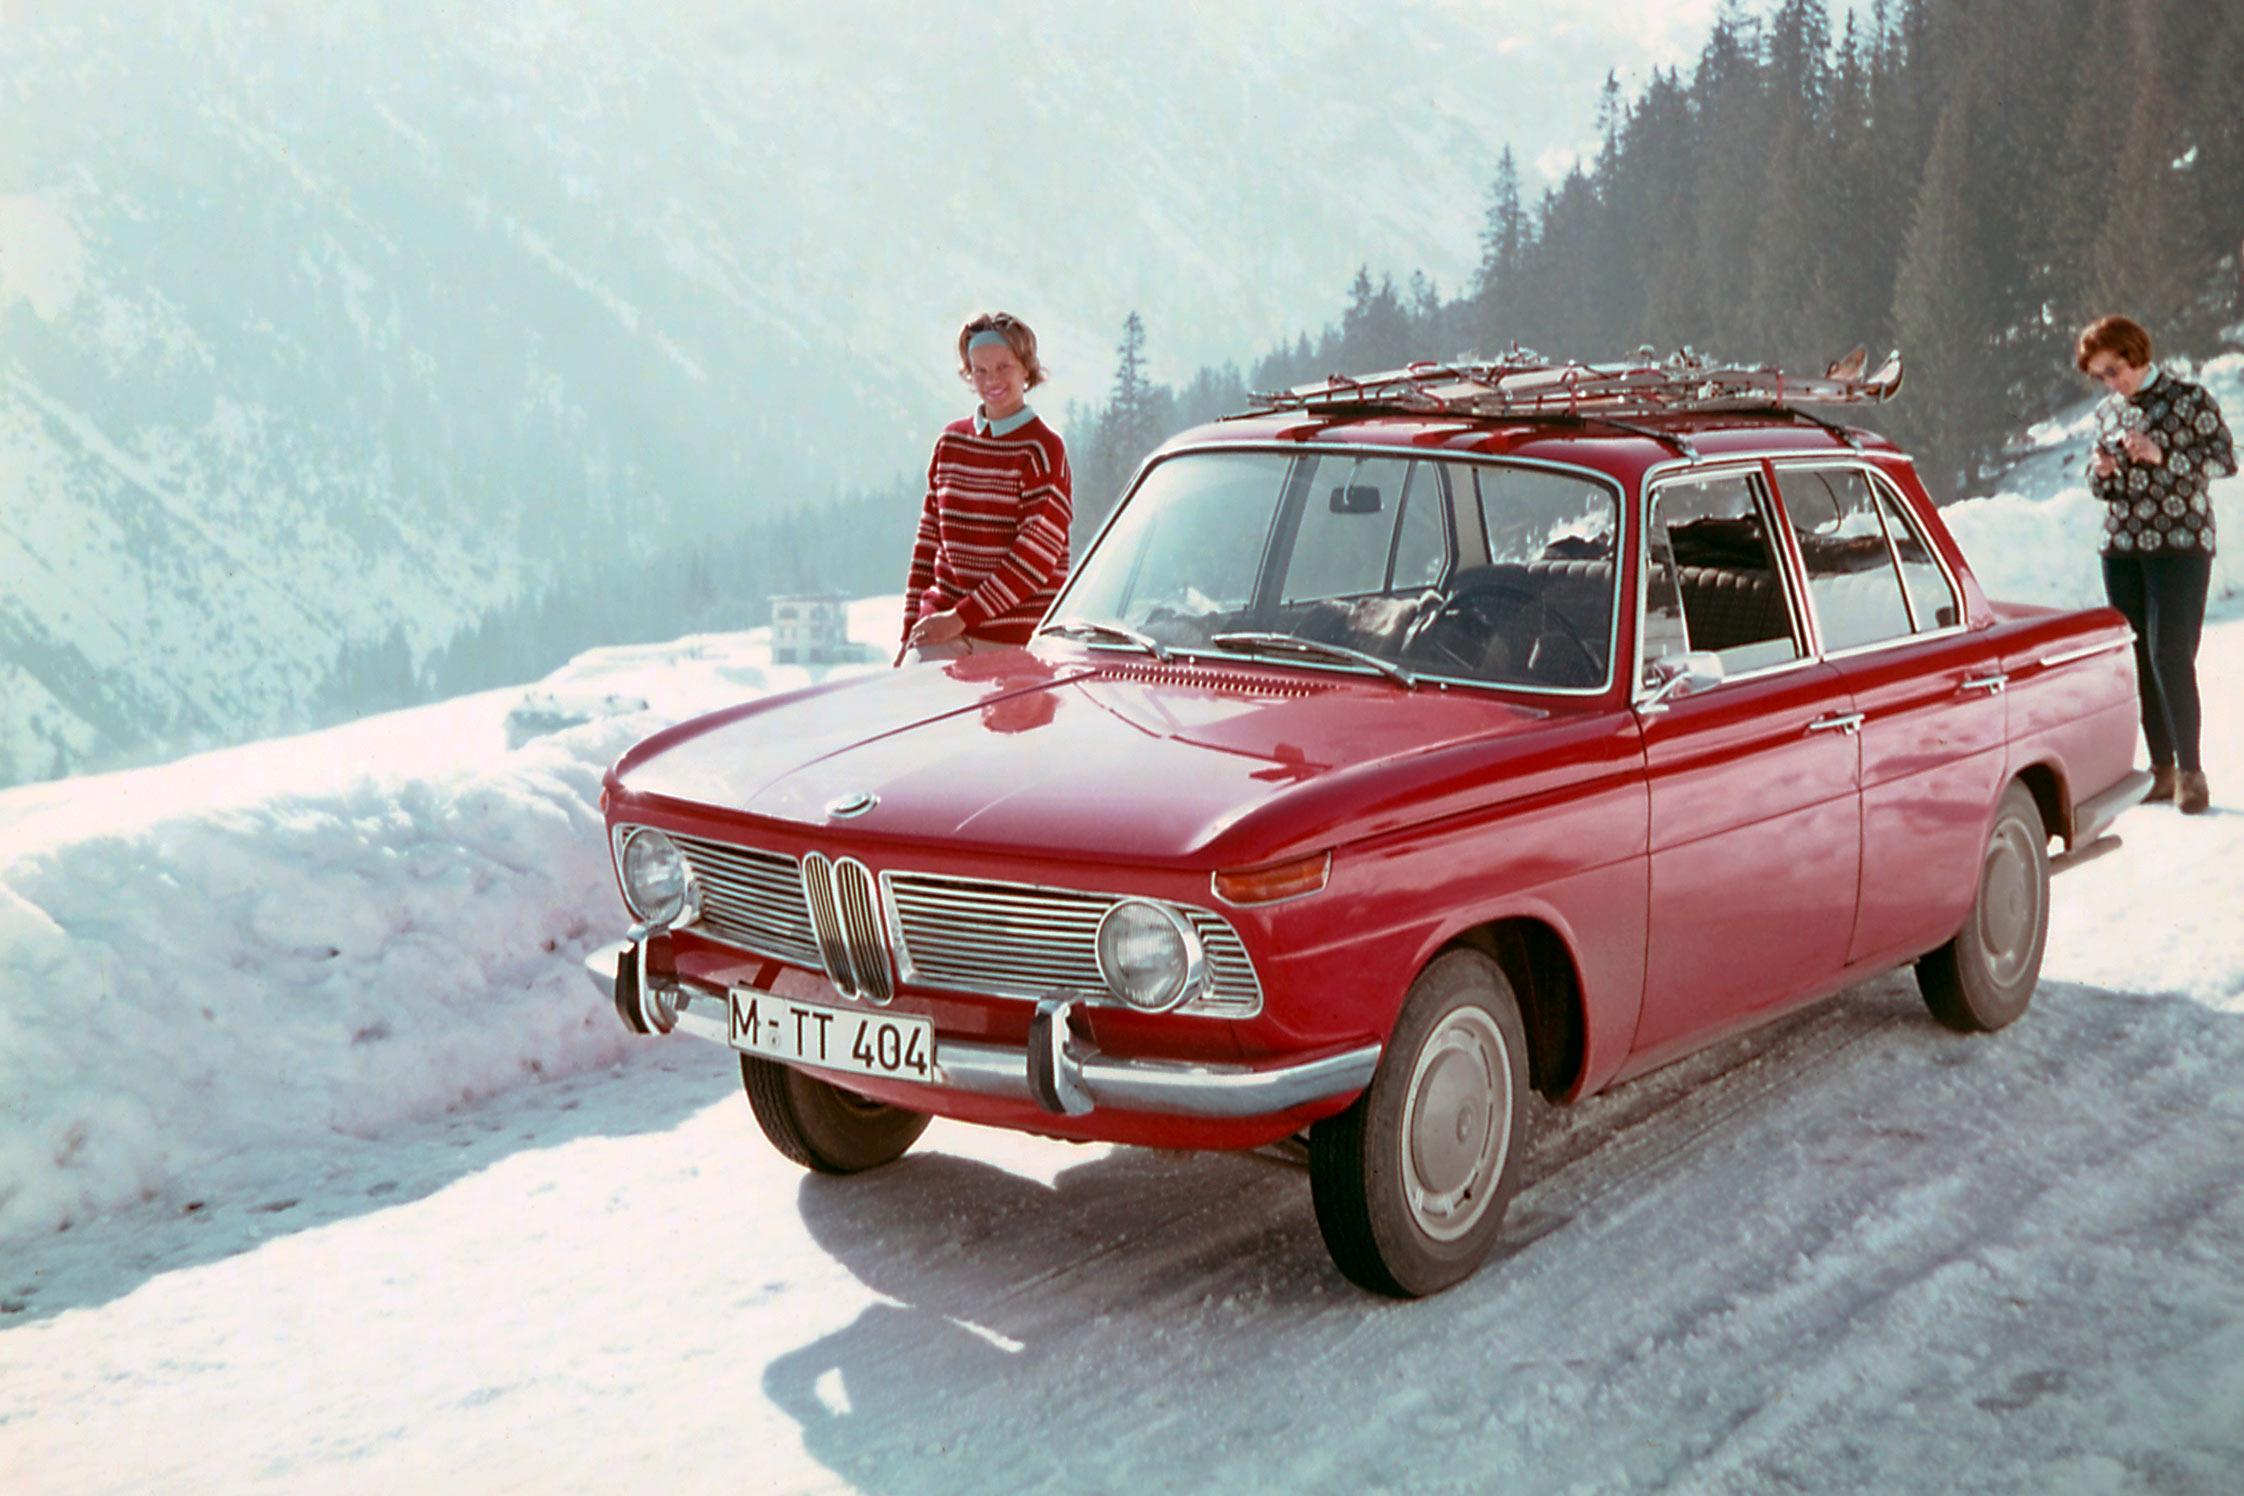 BMW 1500 (1961) - BMW : 100 ans d'aventure - diaporama ...